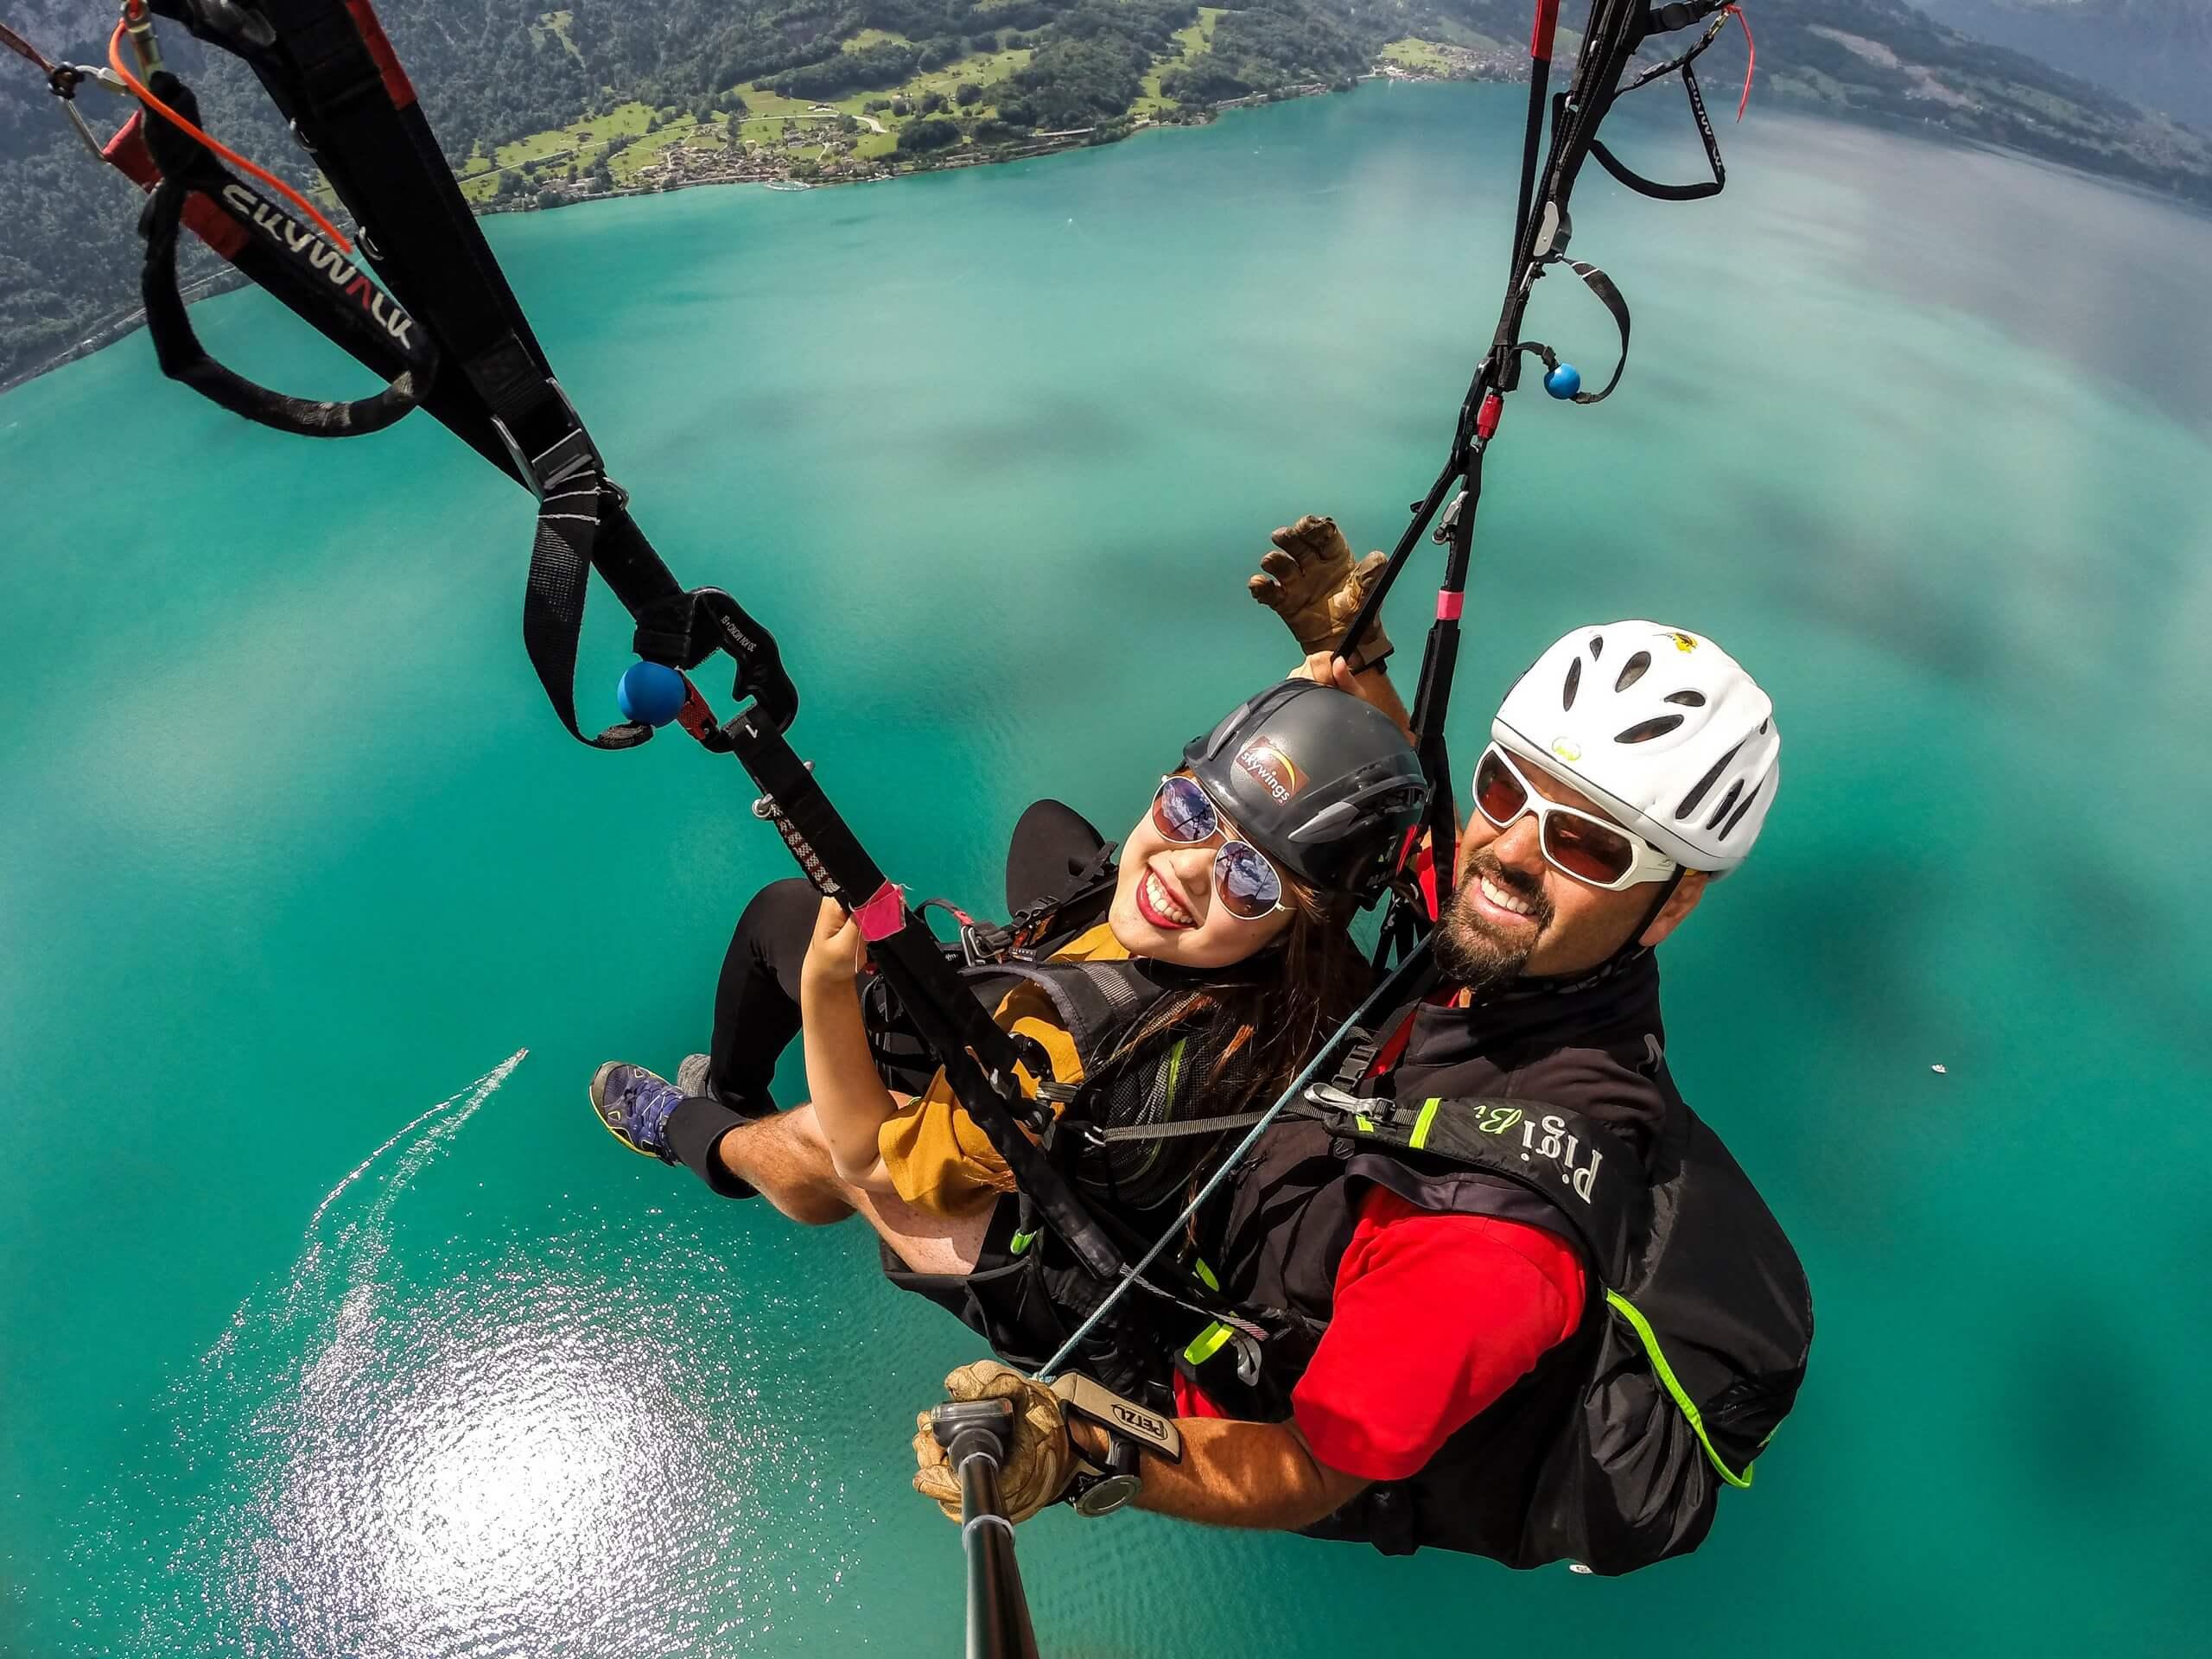 skywings-paragliding-interlaken-sommer-brienzersee-asien